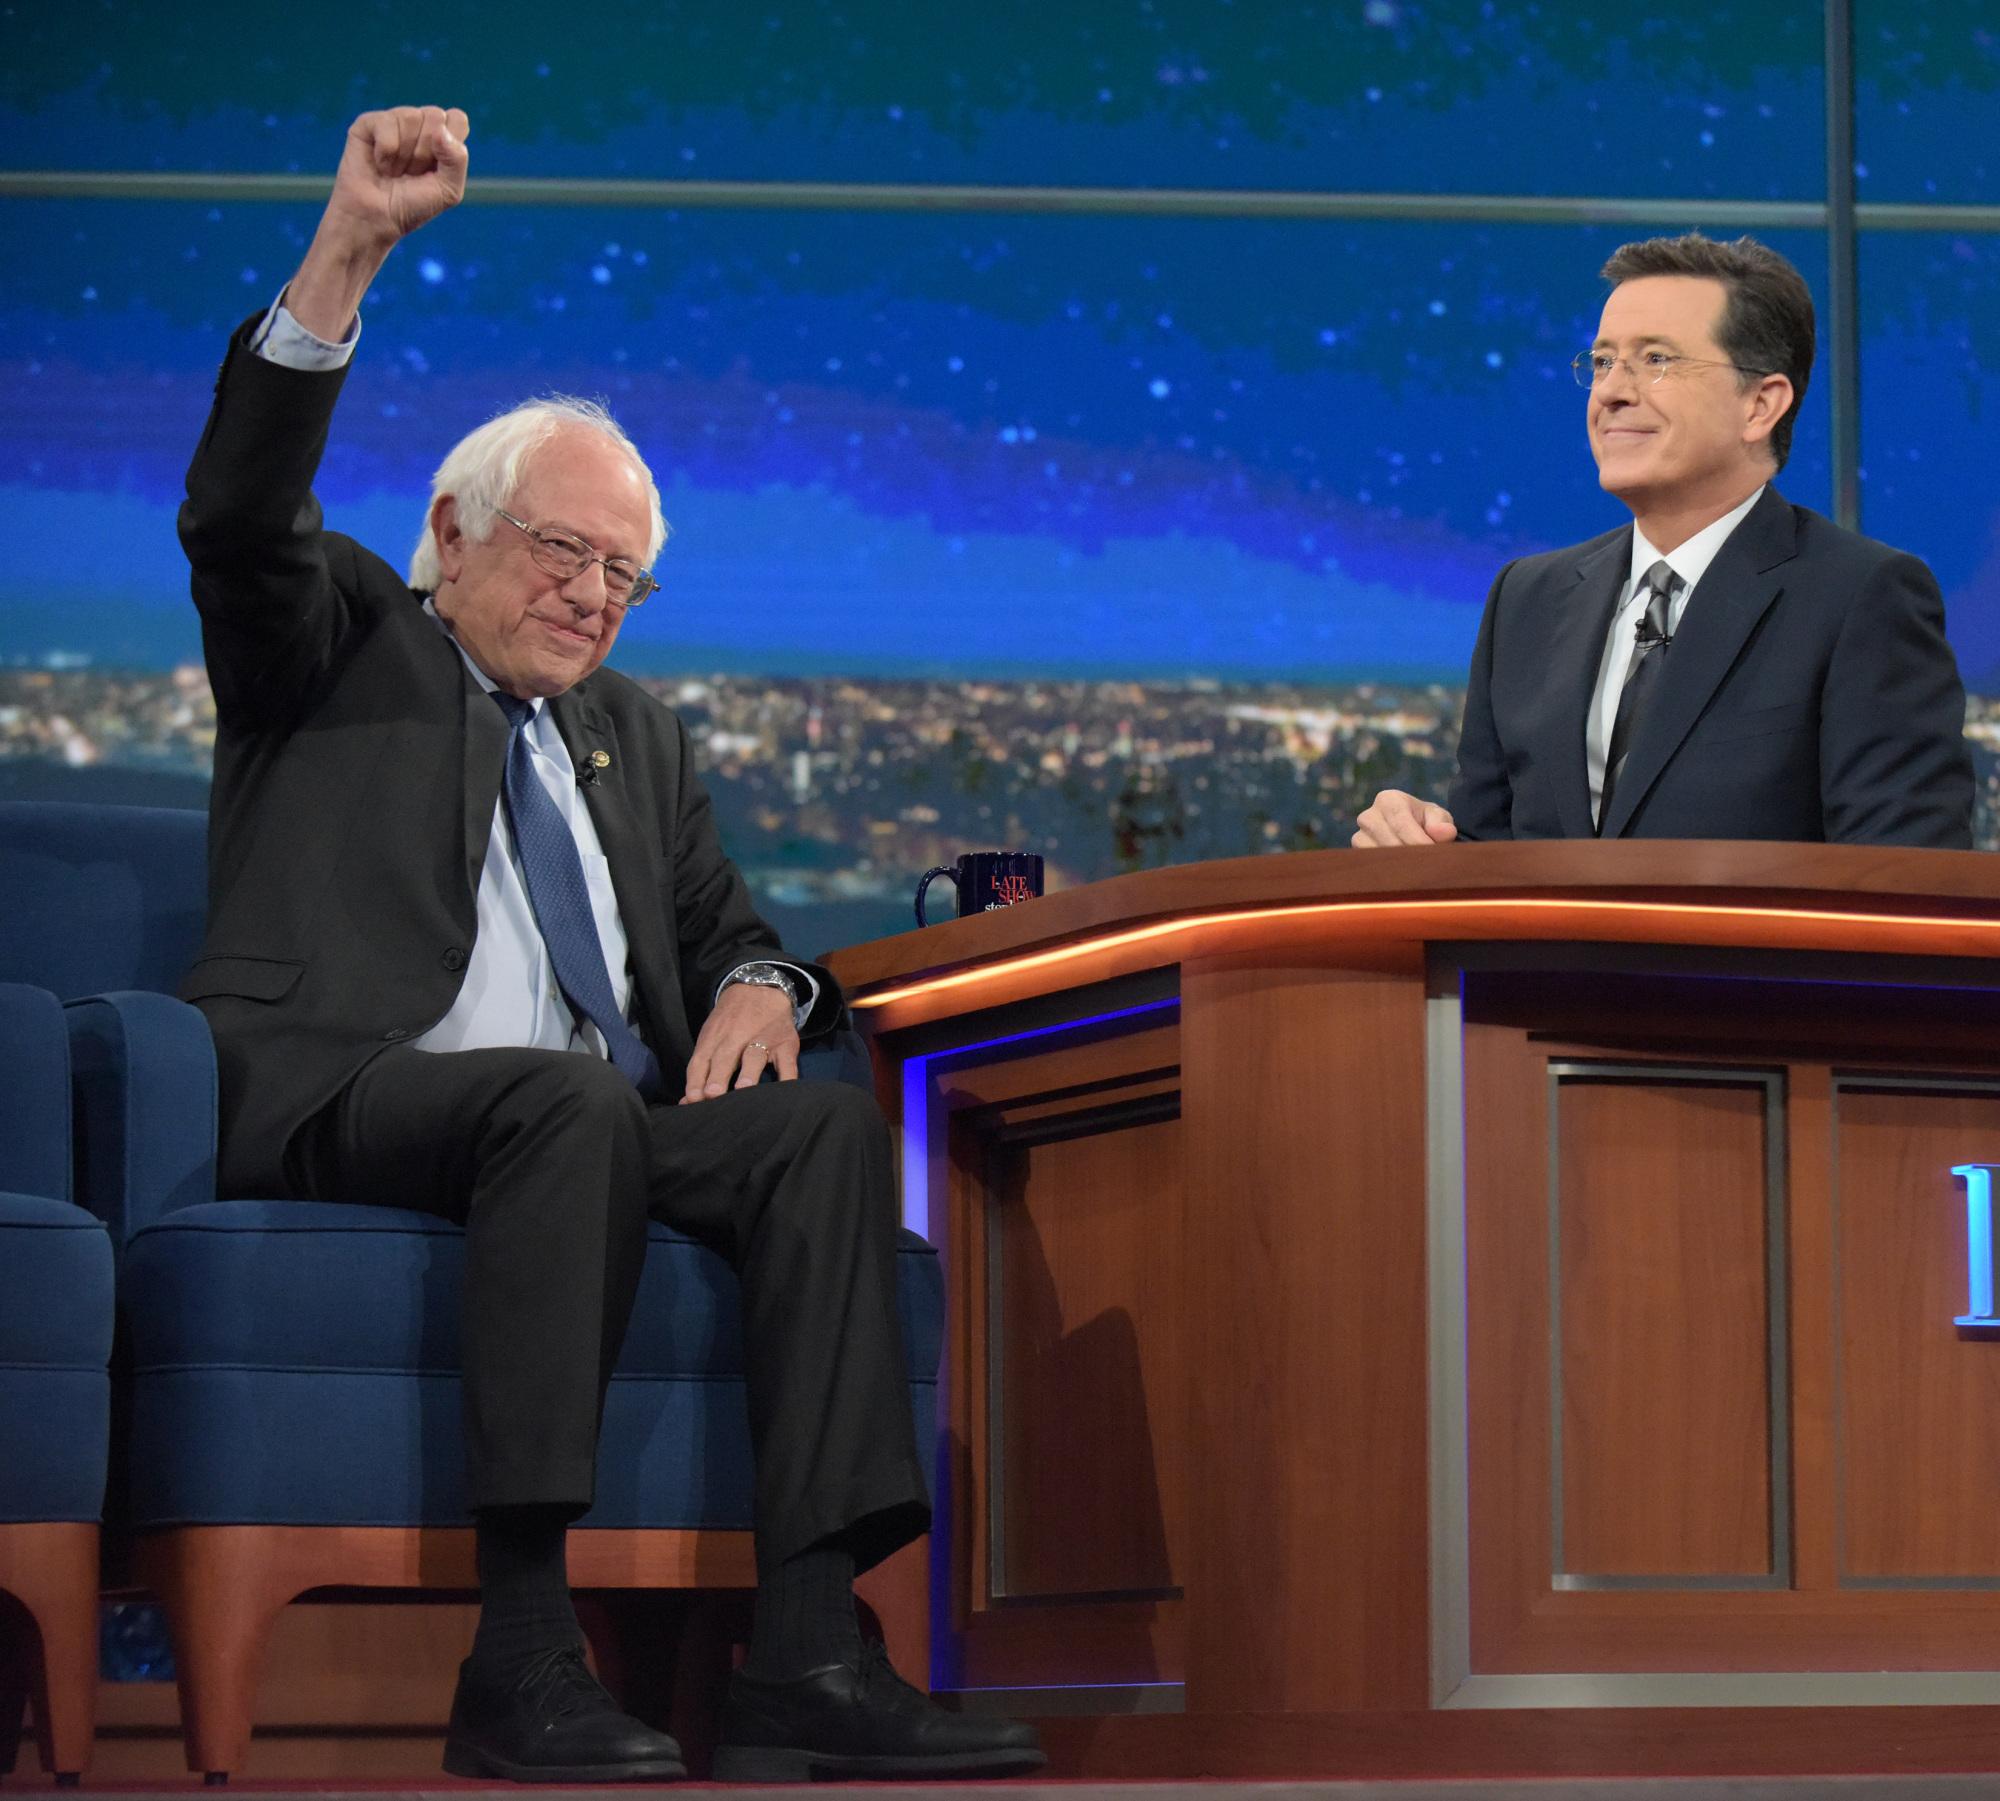 Bernie Sanders Describes The Scene on House Floor During Sit-In